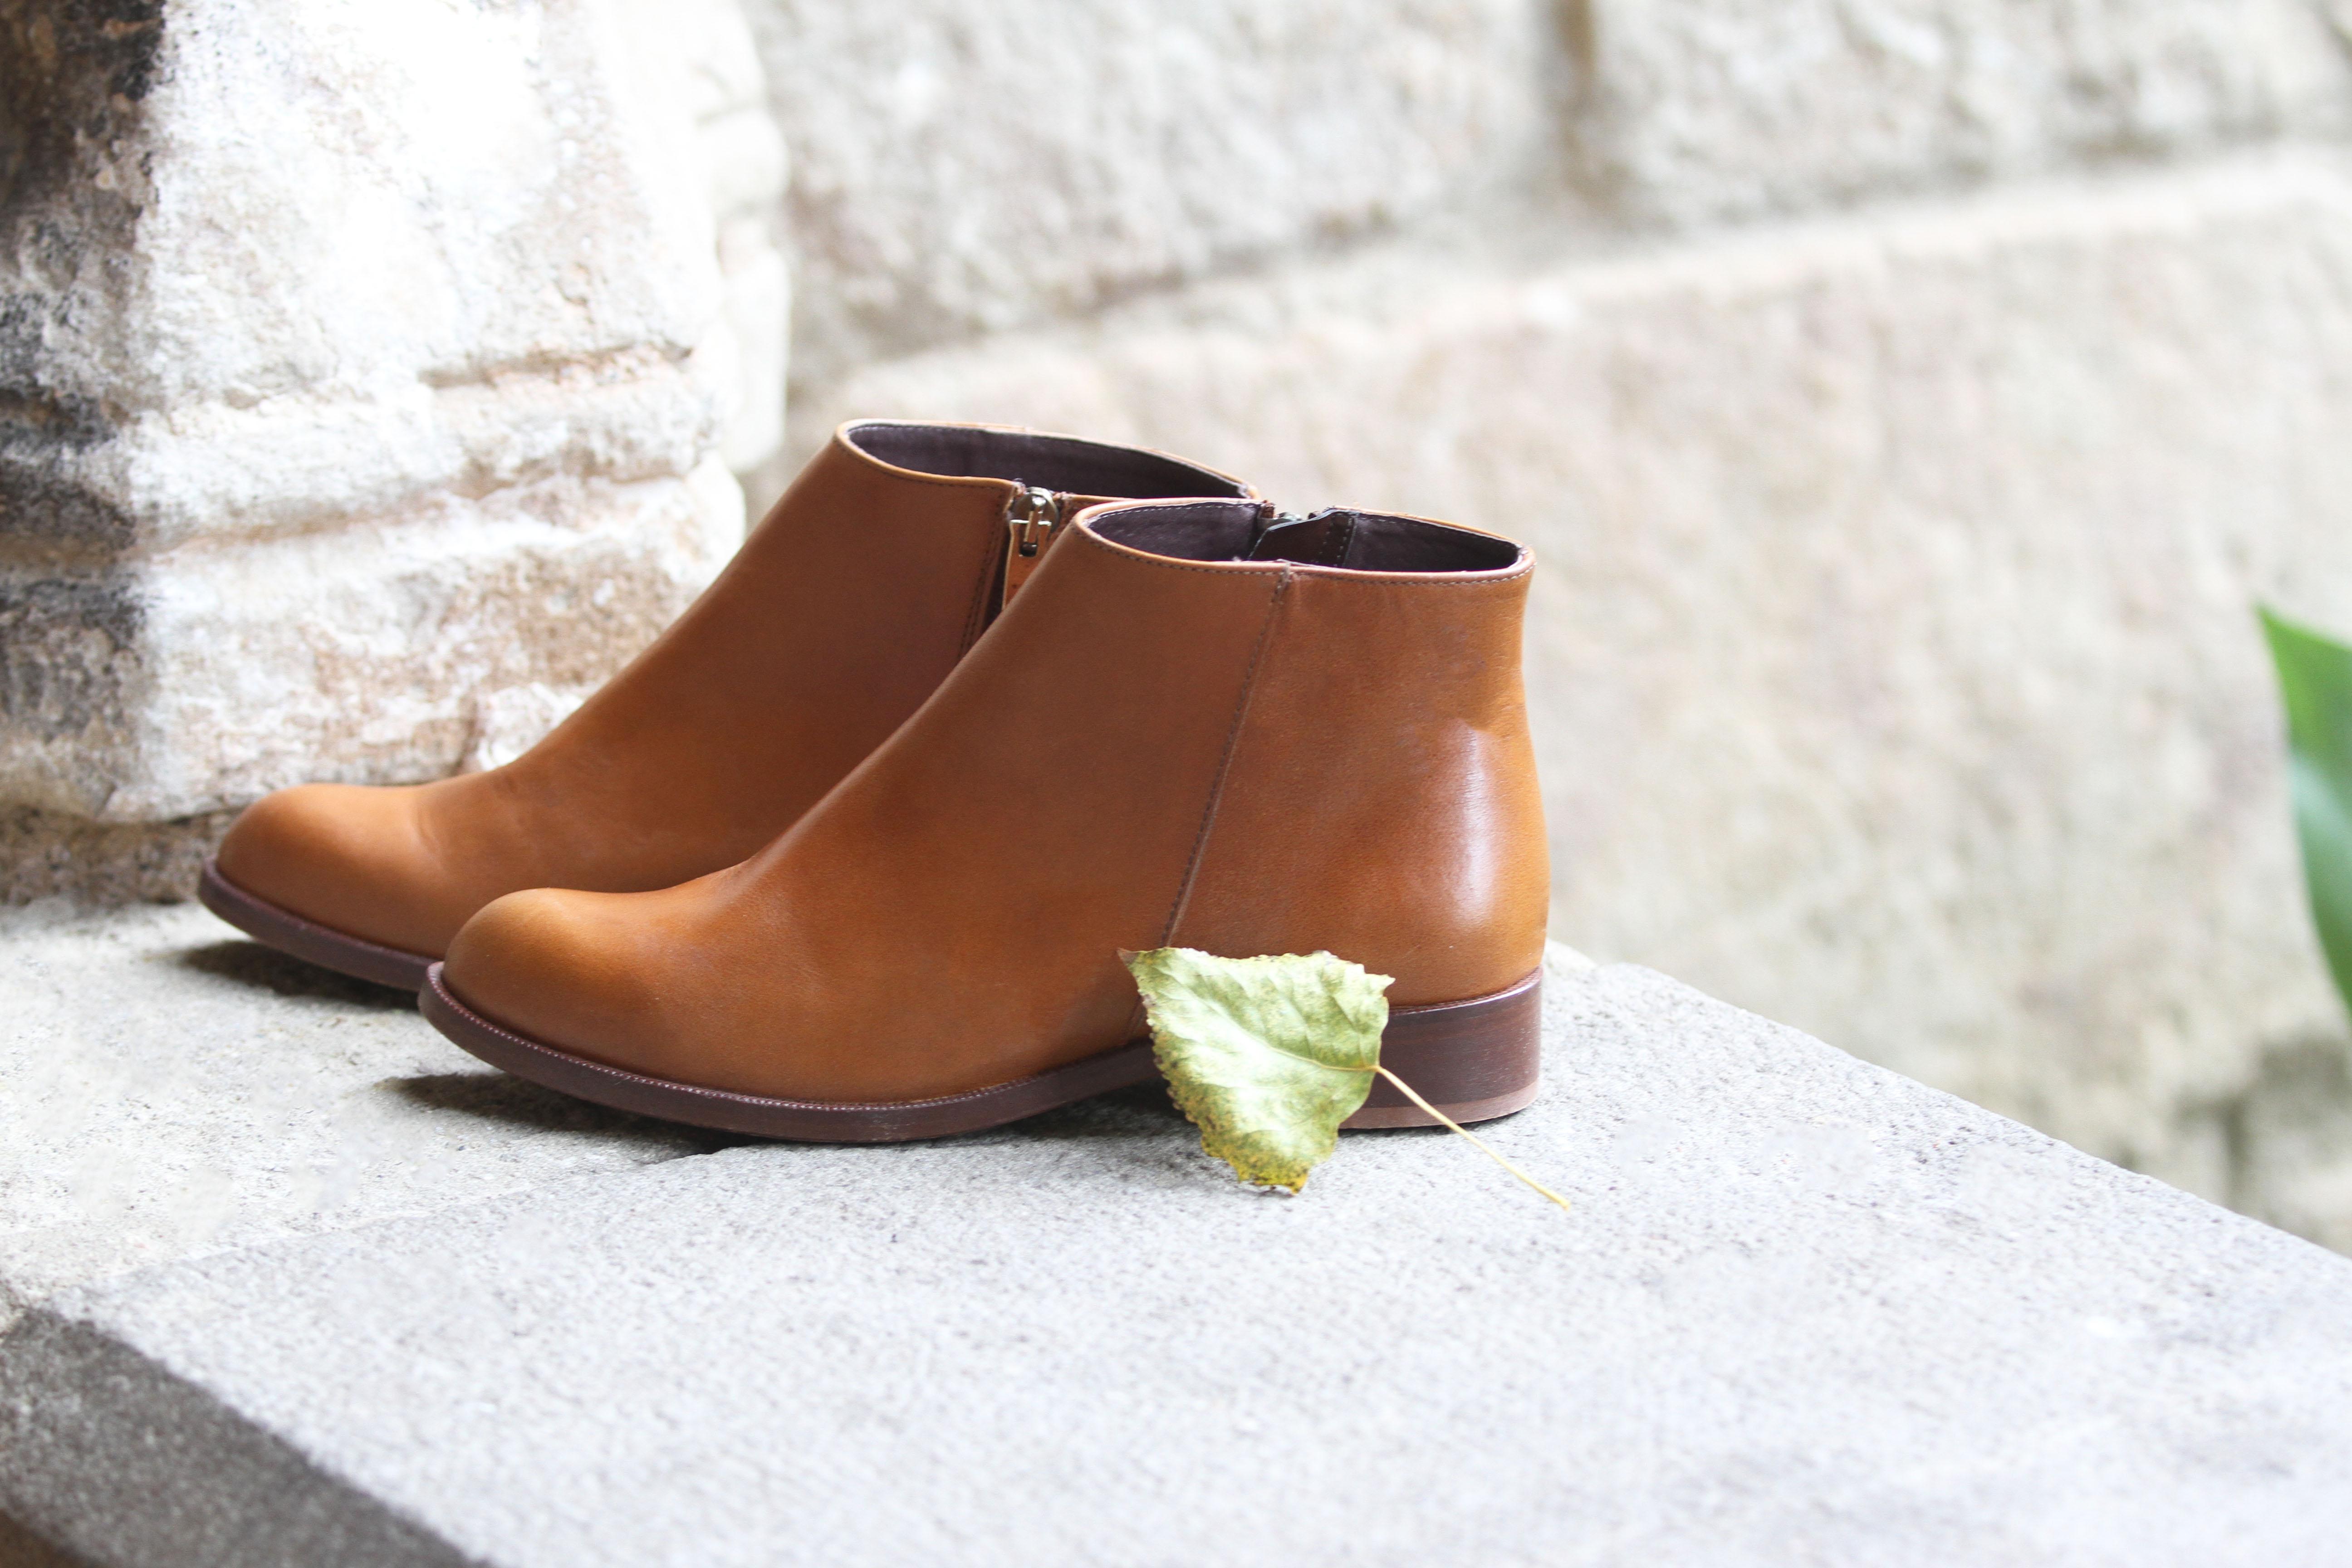 Jules & Jenn les collections chaussures femme bottines plates